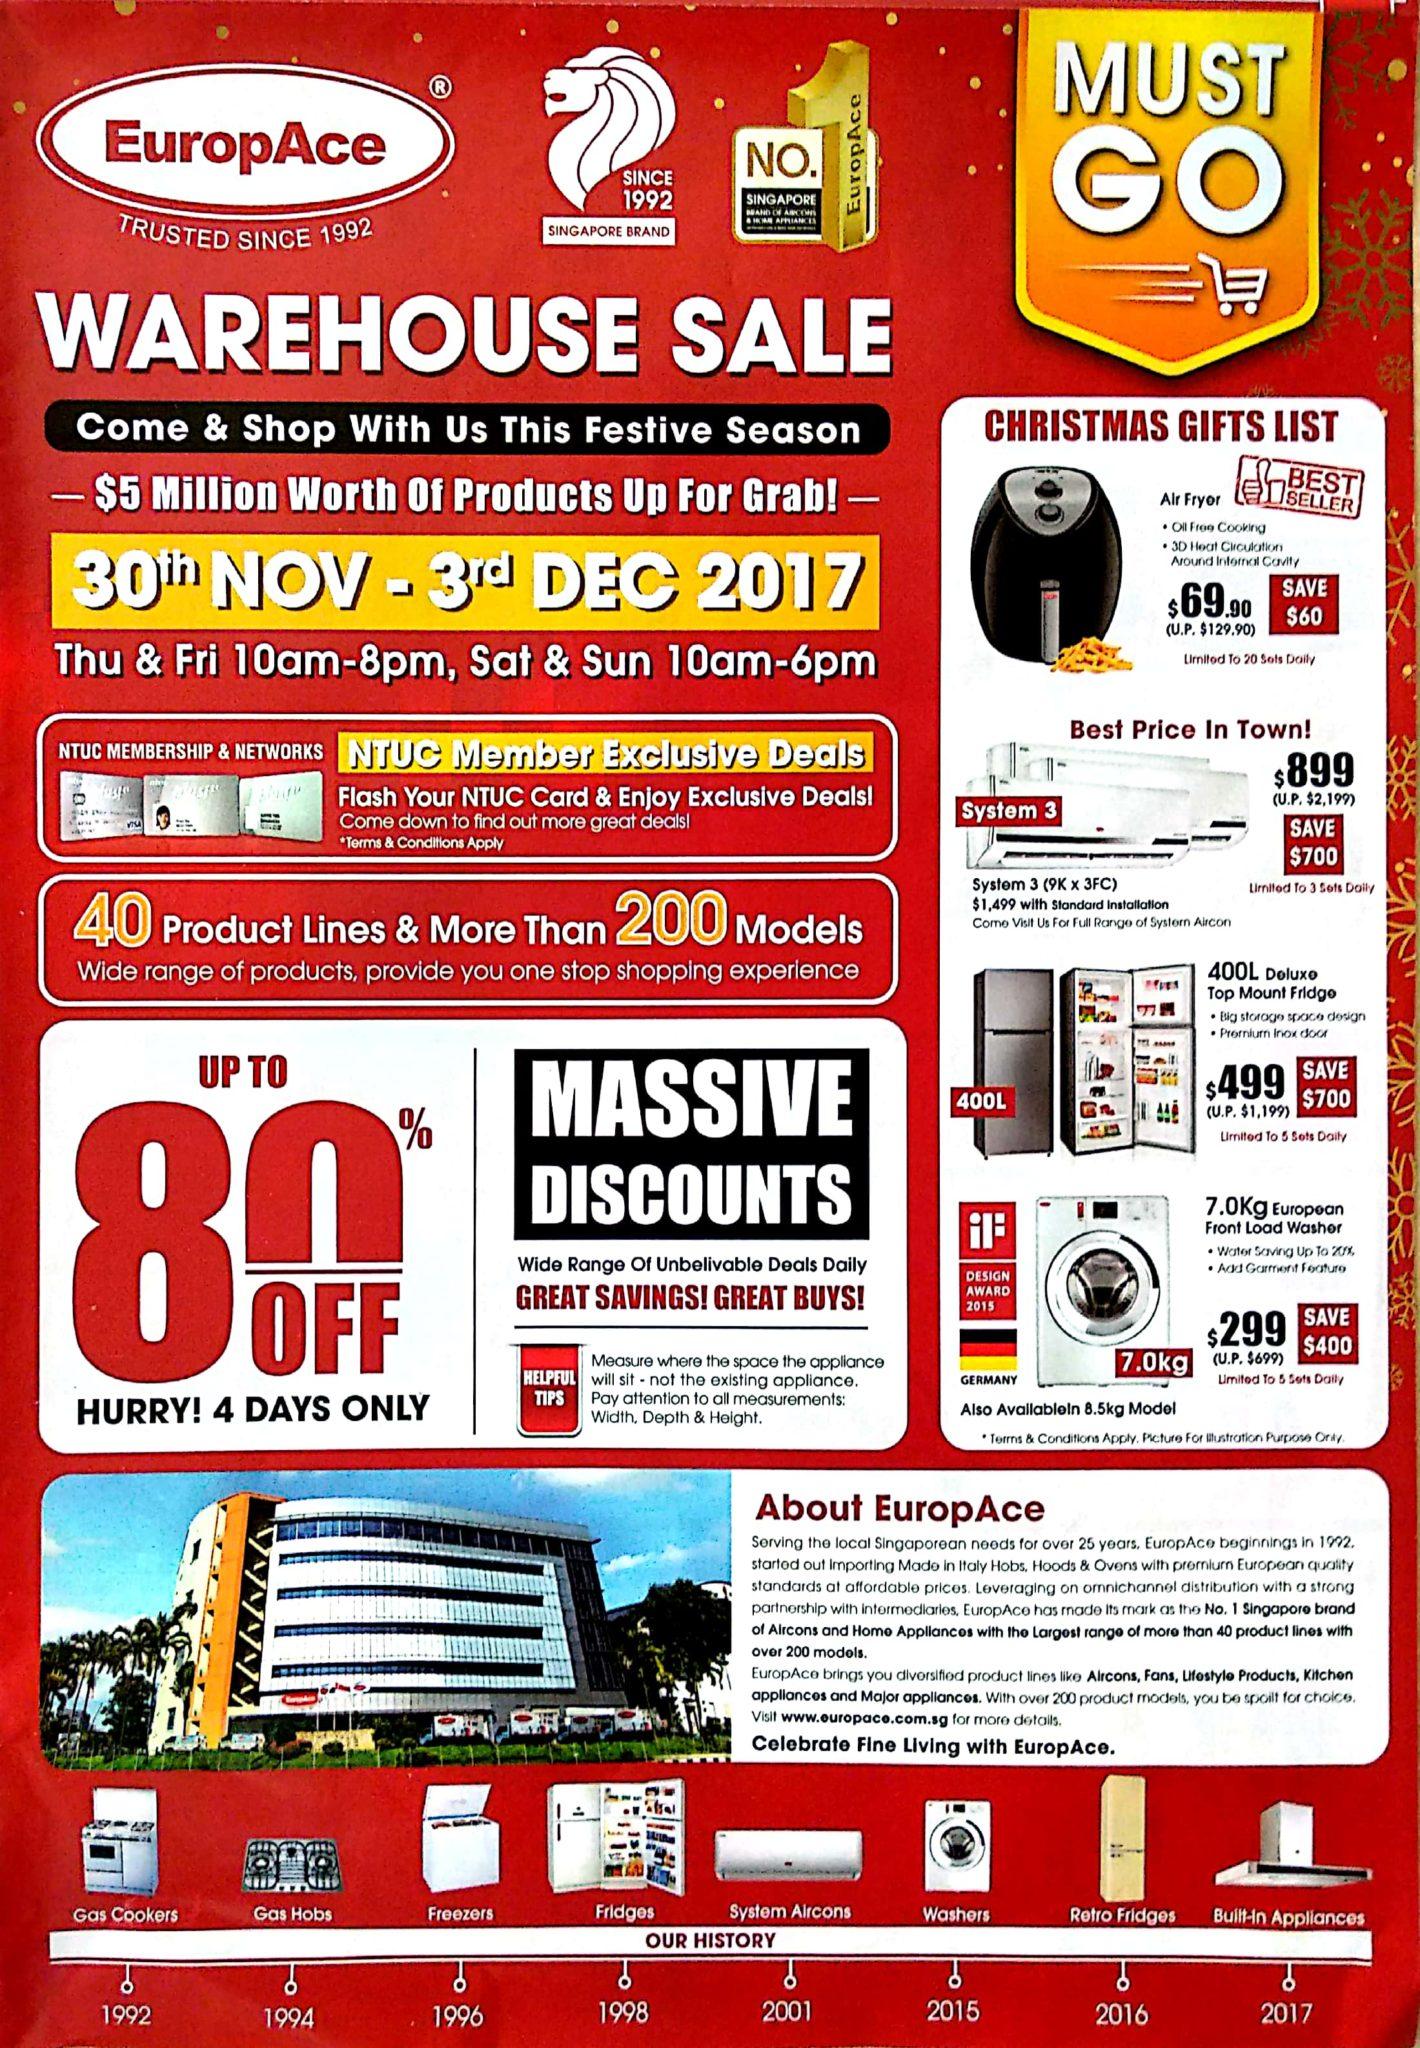 EuropAce Warehouse Sale | 30 Nov - 3 Dec 2017 | Brochure pg1